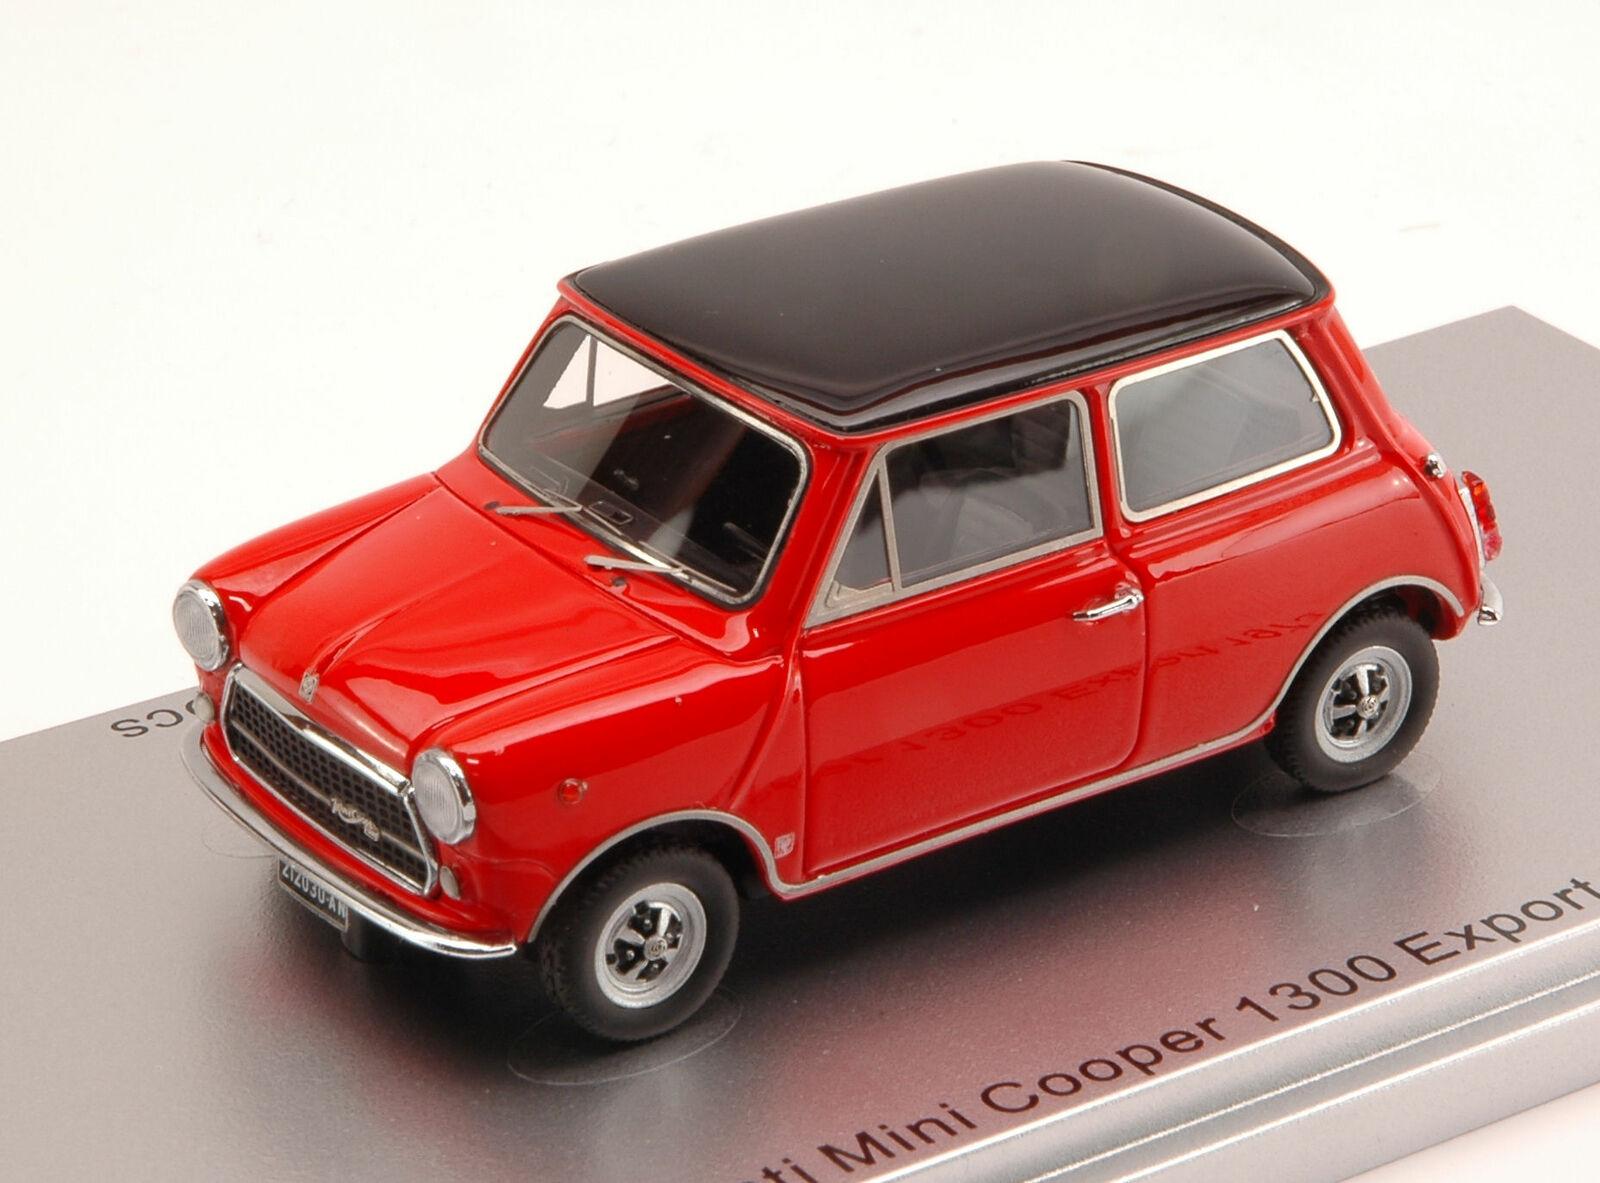 Innocenti Mini Cooper 1300 Export 1973 rot 1 43 Kess Model KS43012030 Miniature